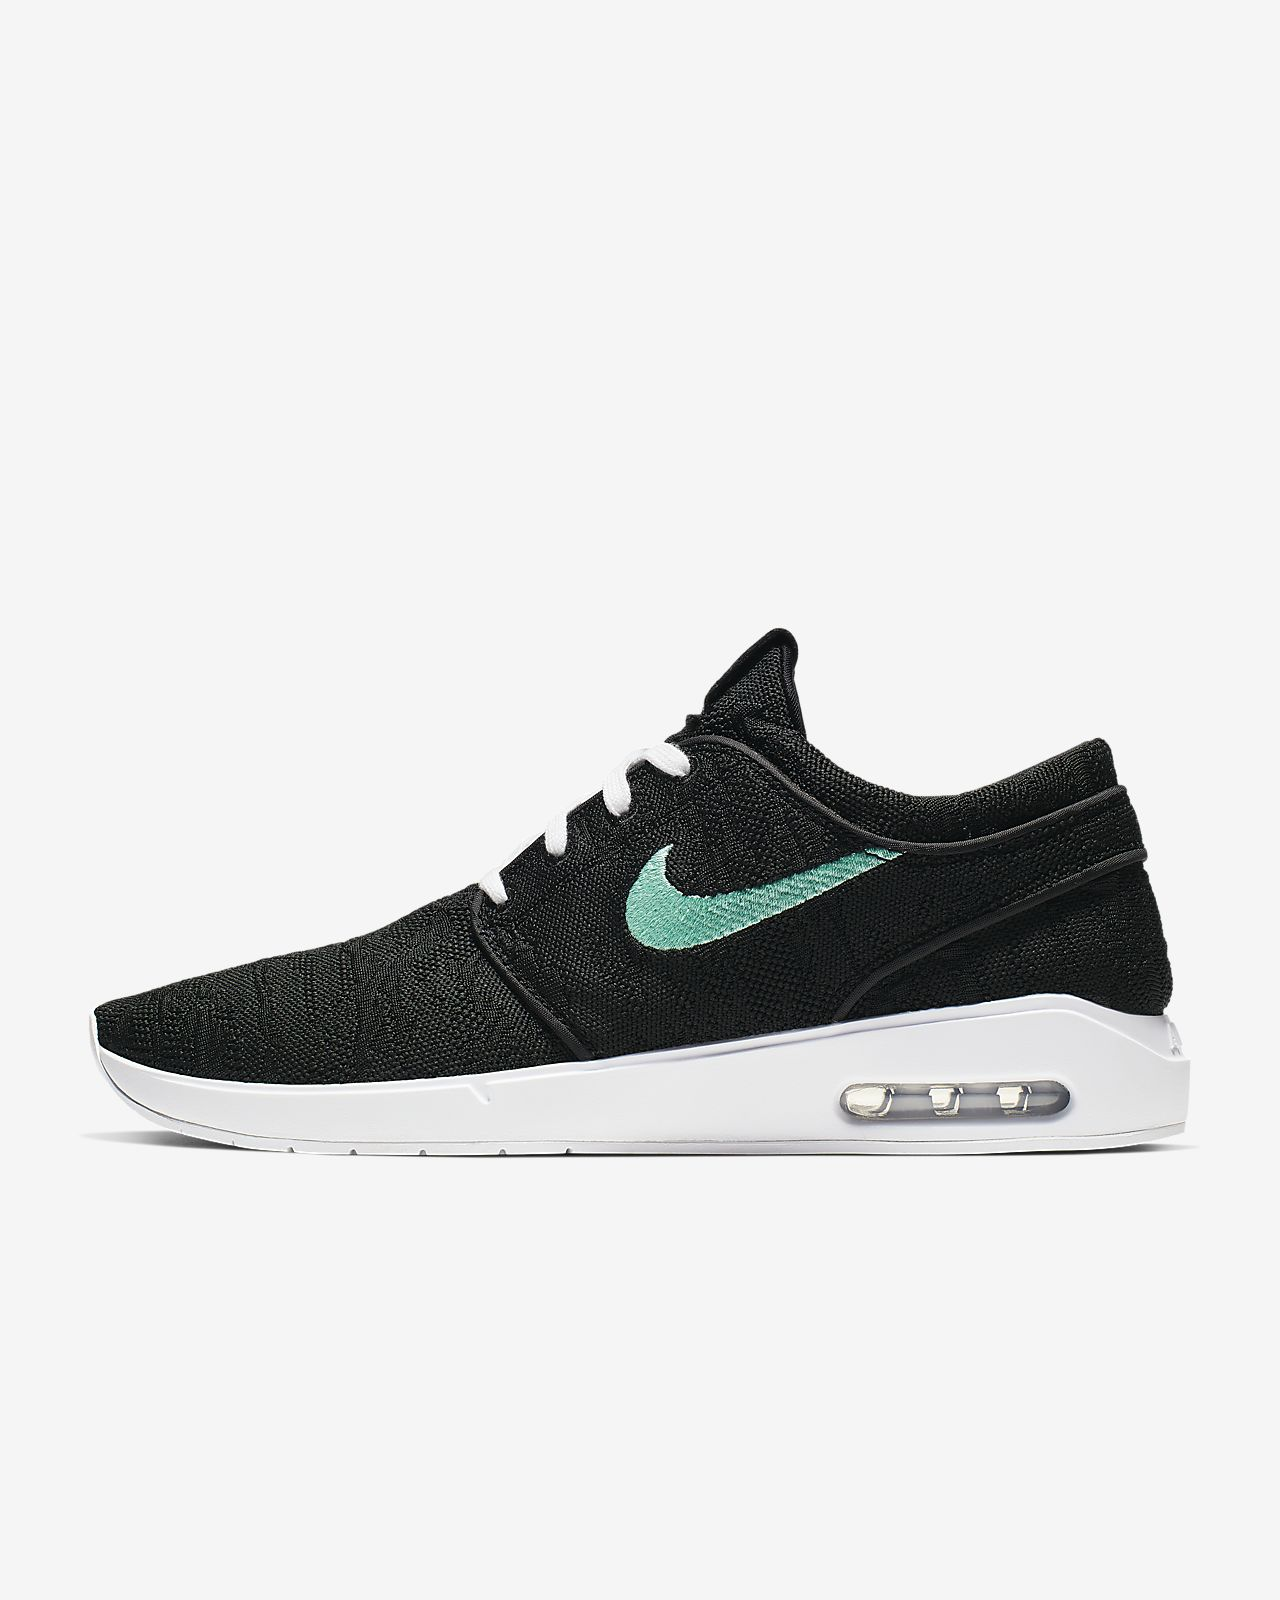 new styles 6b3c9 b2f49 ... Nike SB Air Max Stefan Janoski 2 Men s Skate Shoe